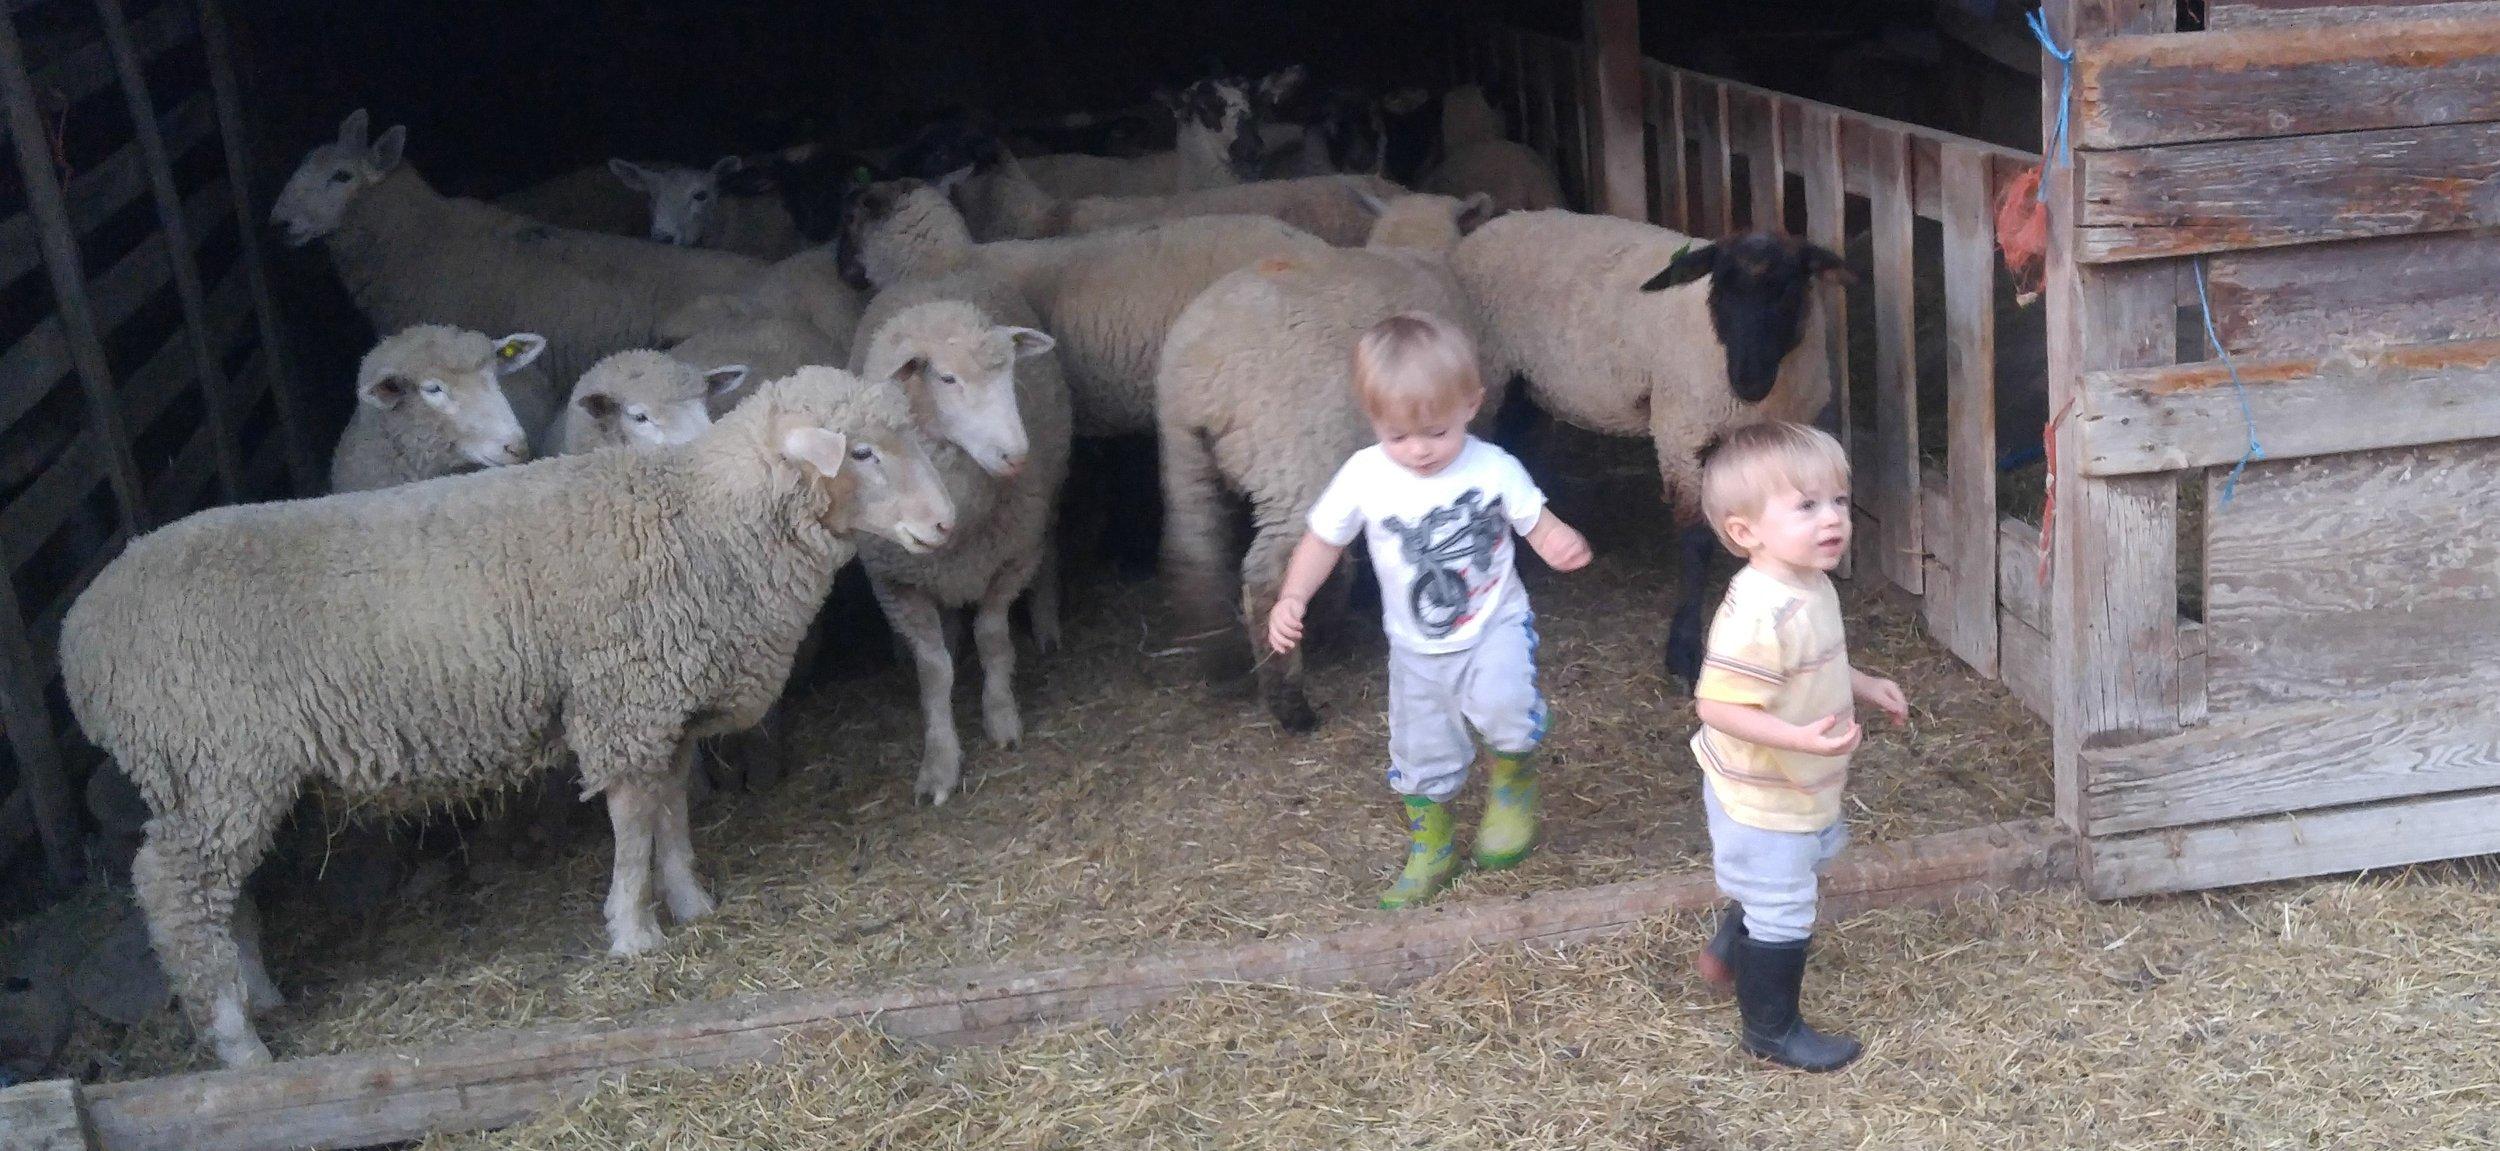 boys with sheep 2.jpg